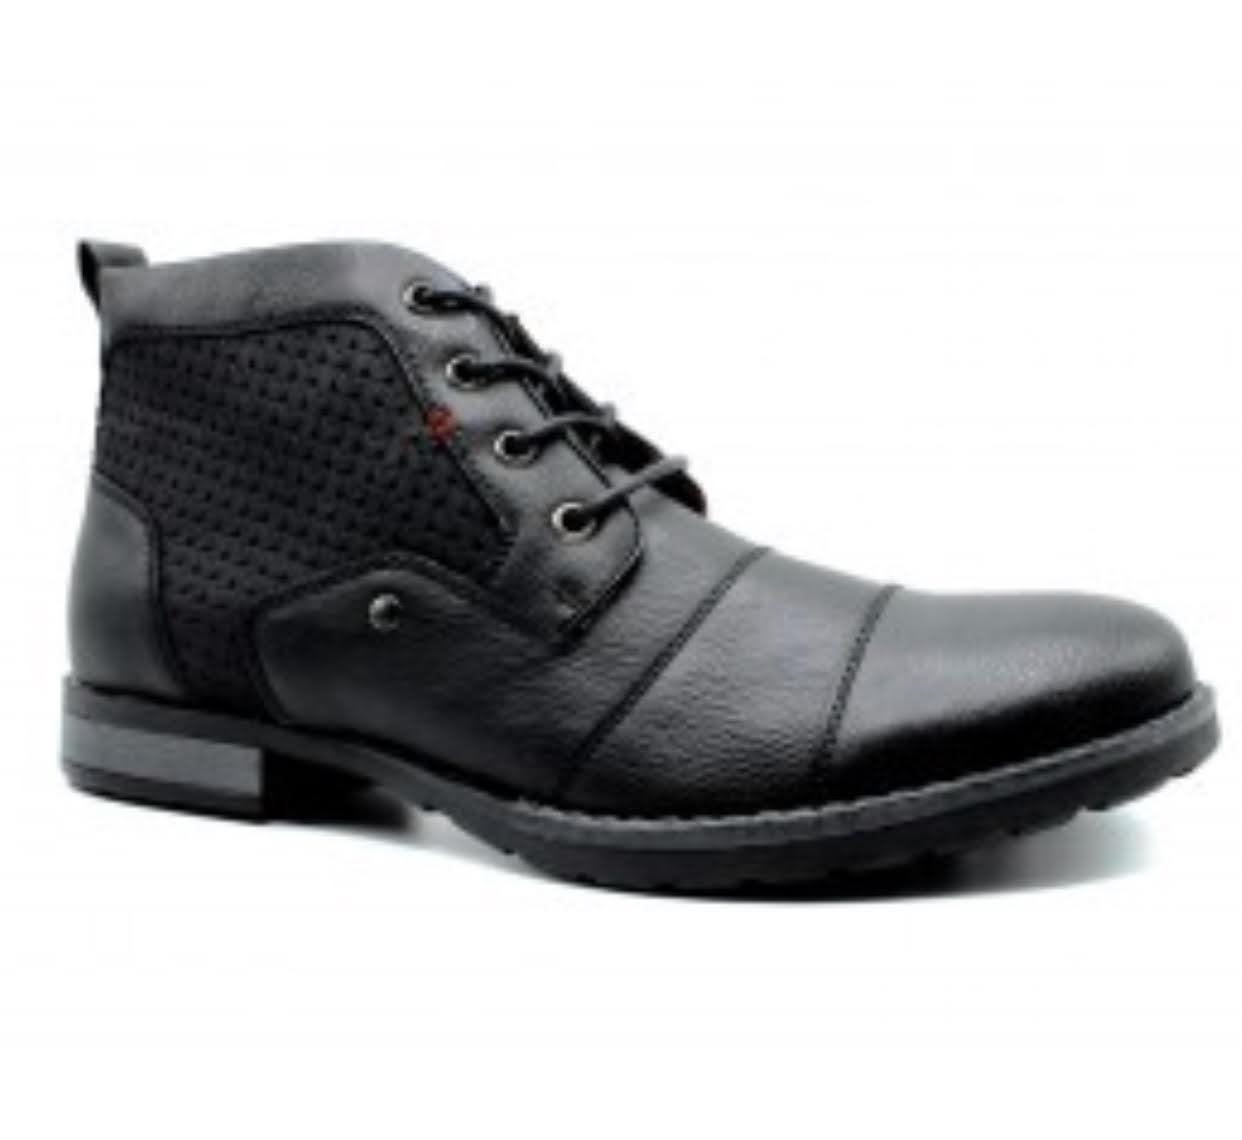 604eab3574f7 Menswear Men s Shoes - Black Ankle Boots - Stevie Coleman Clothing